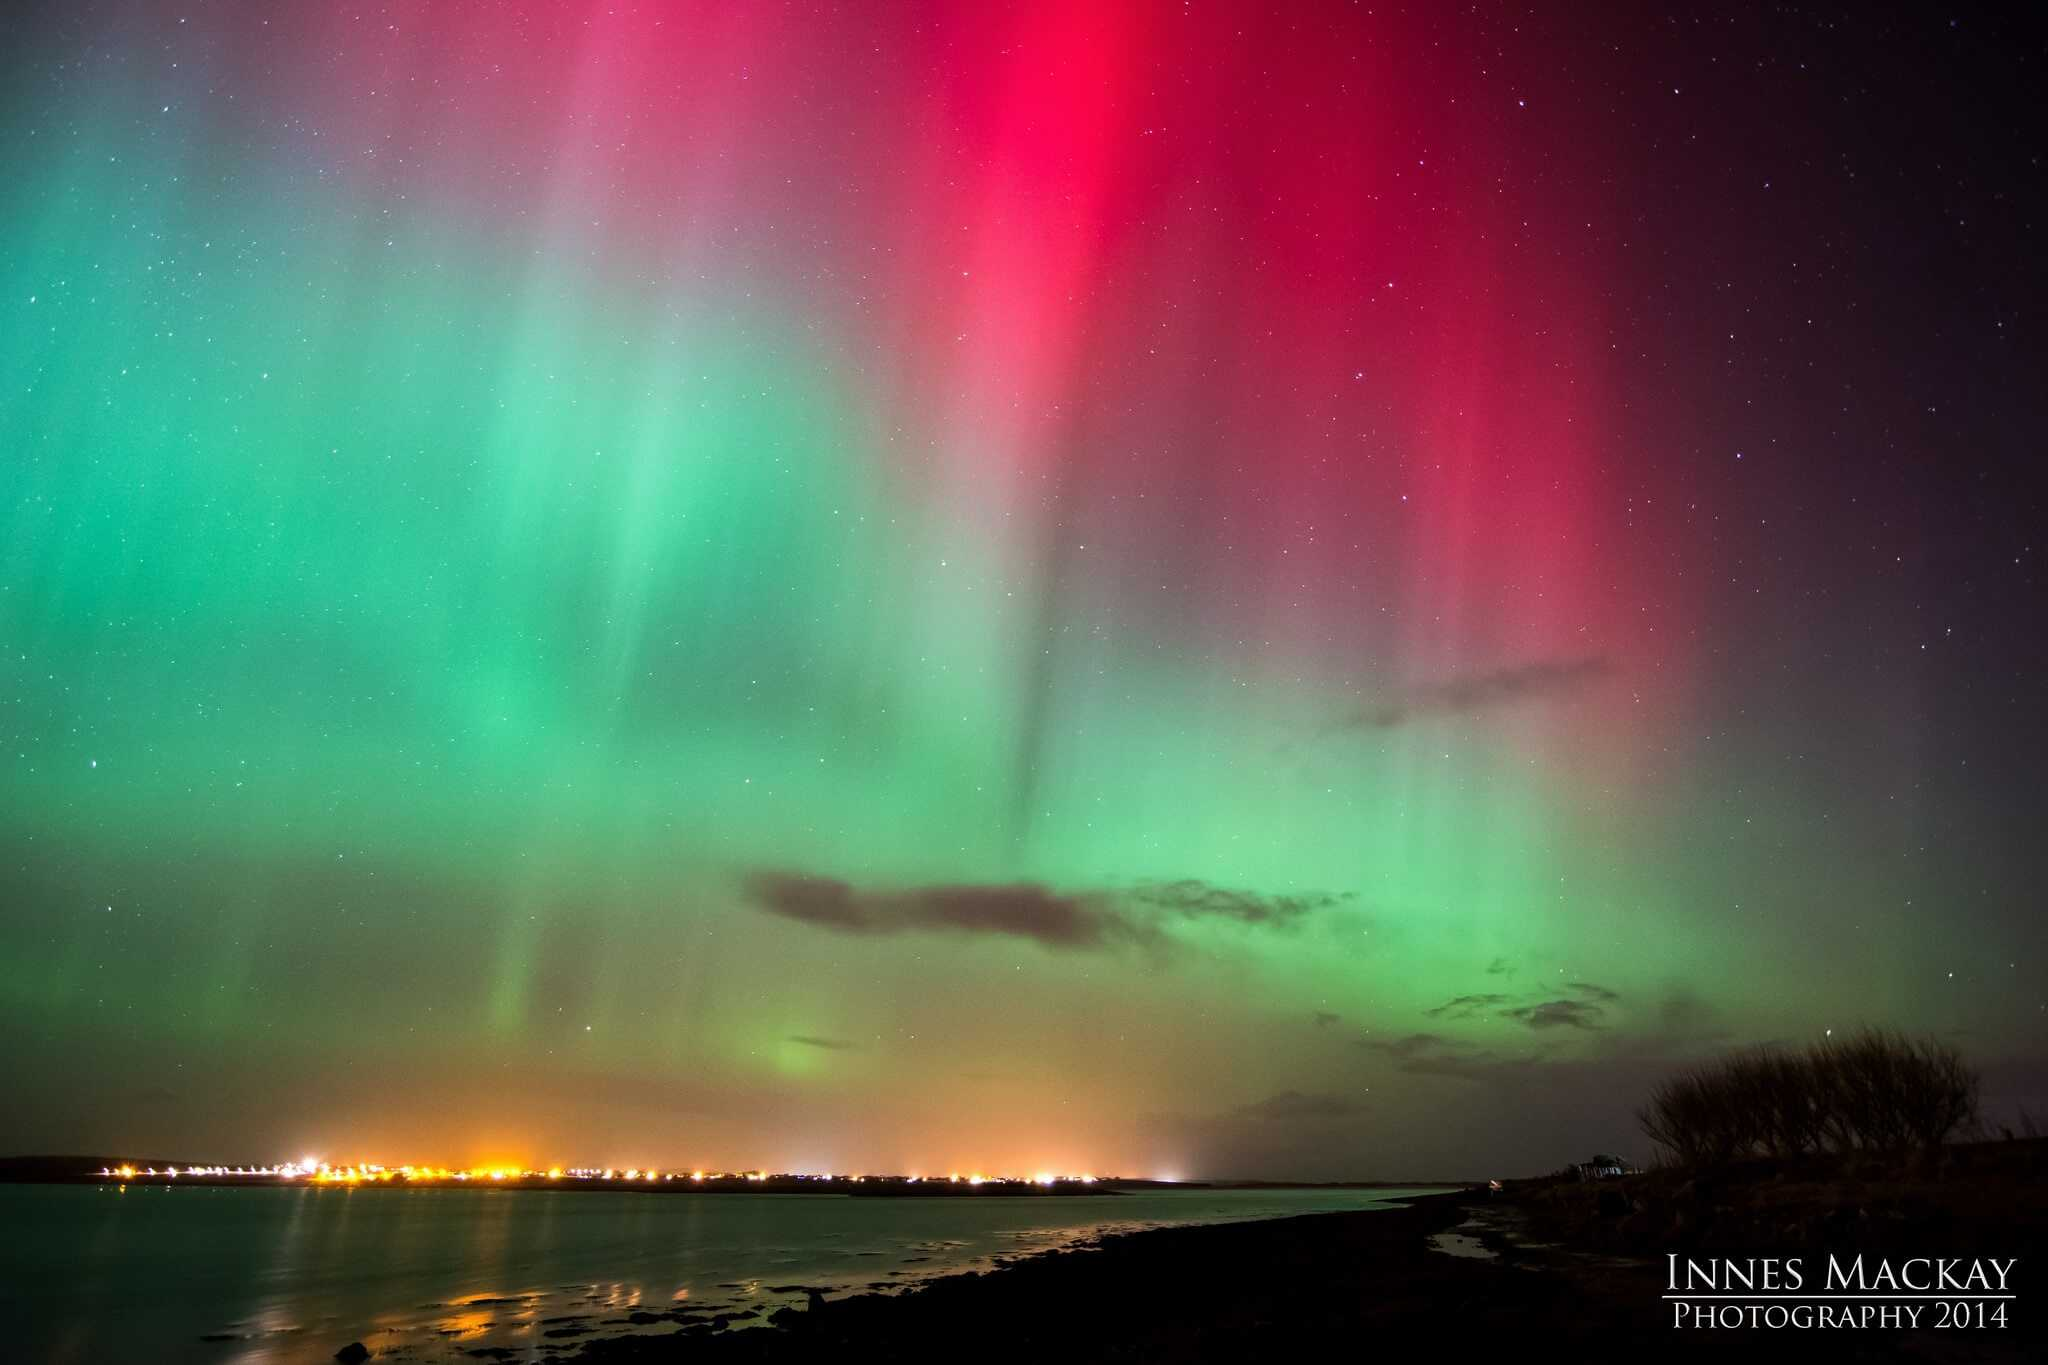 innes-mackay-aurora